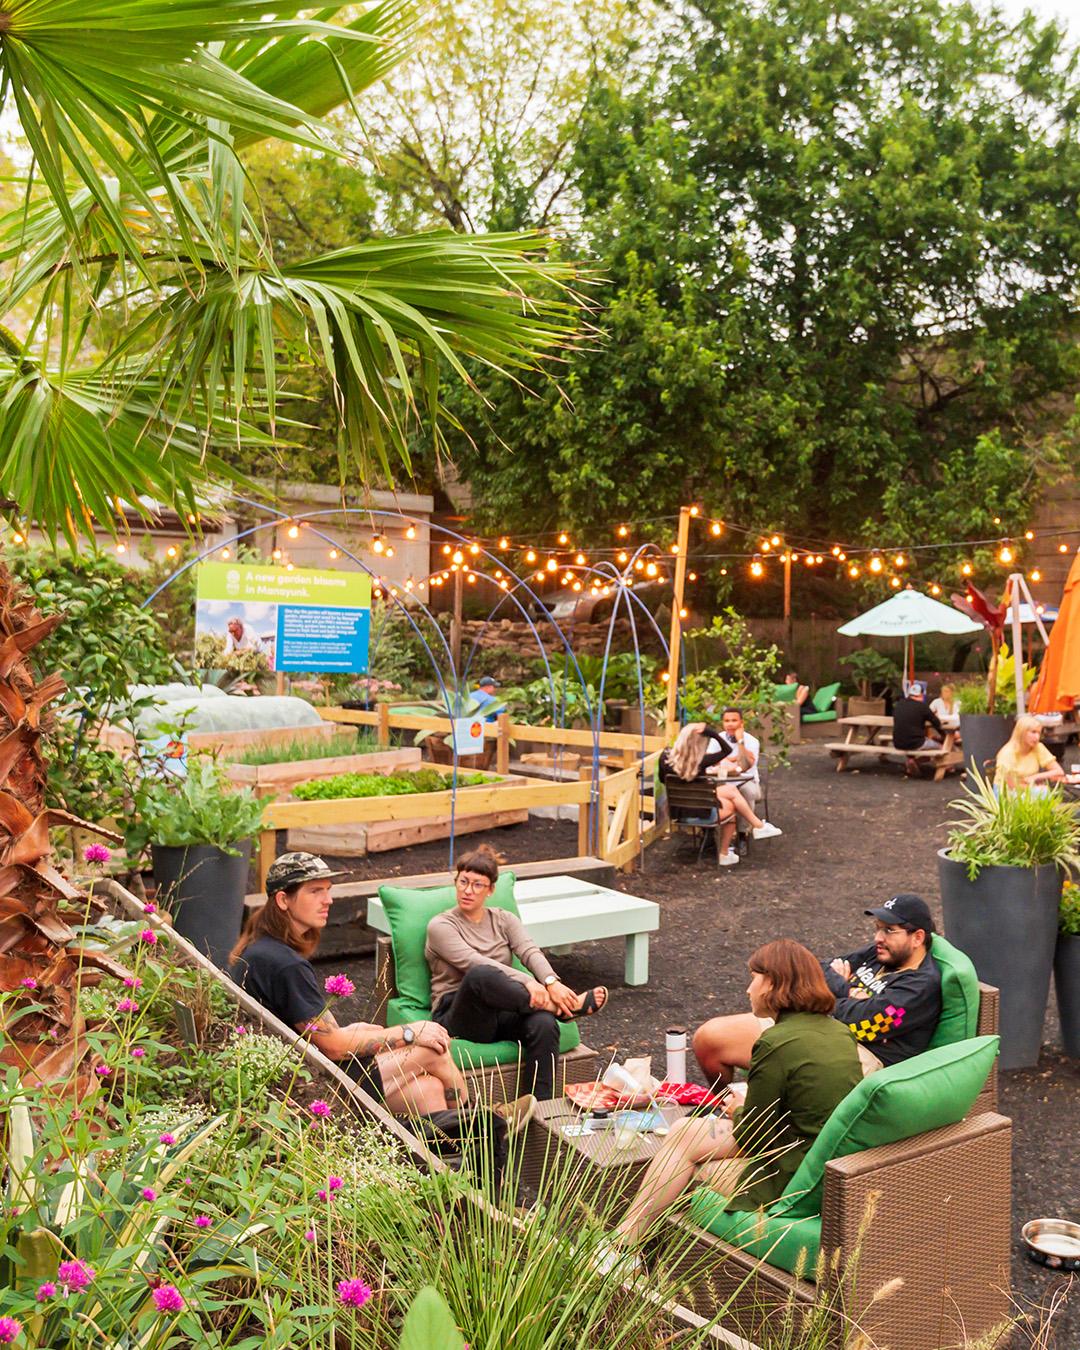 phs beer garden manayunk 2